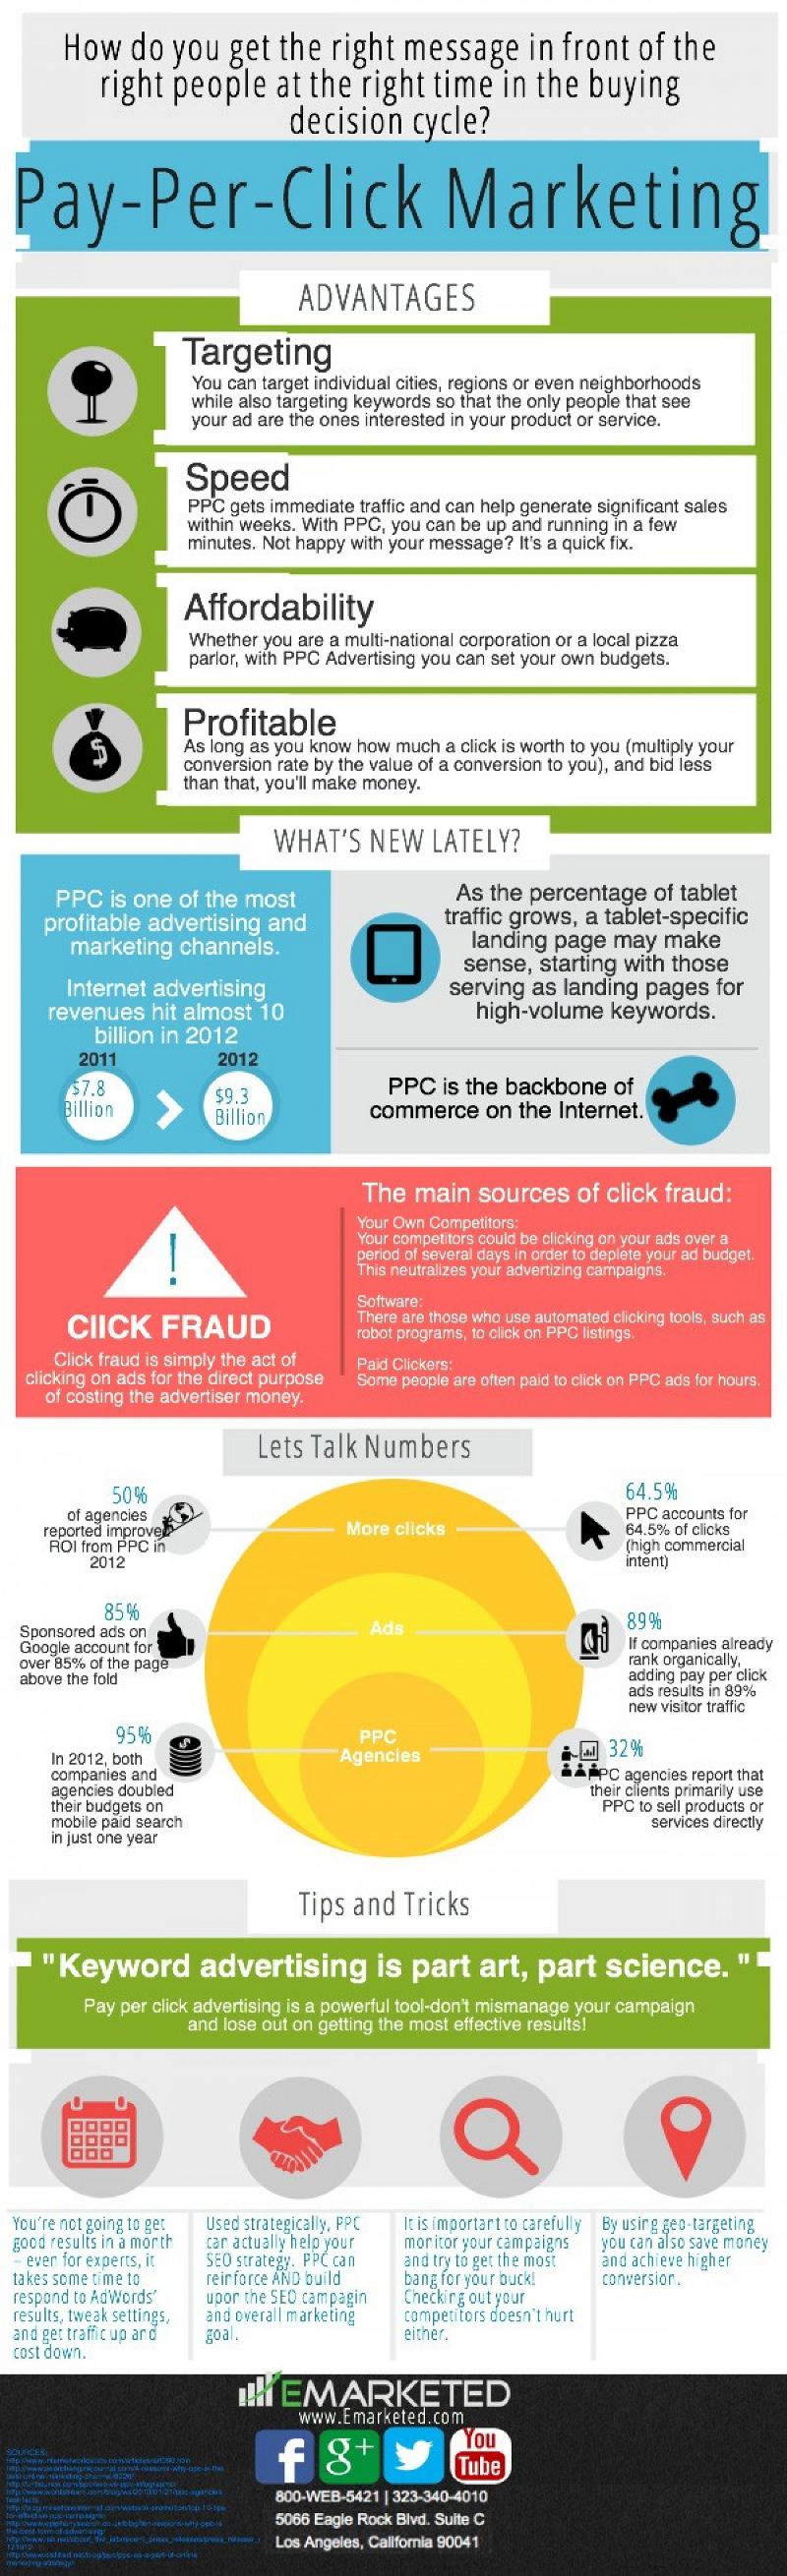 Basics of PPC Advertising